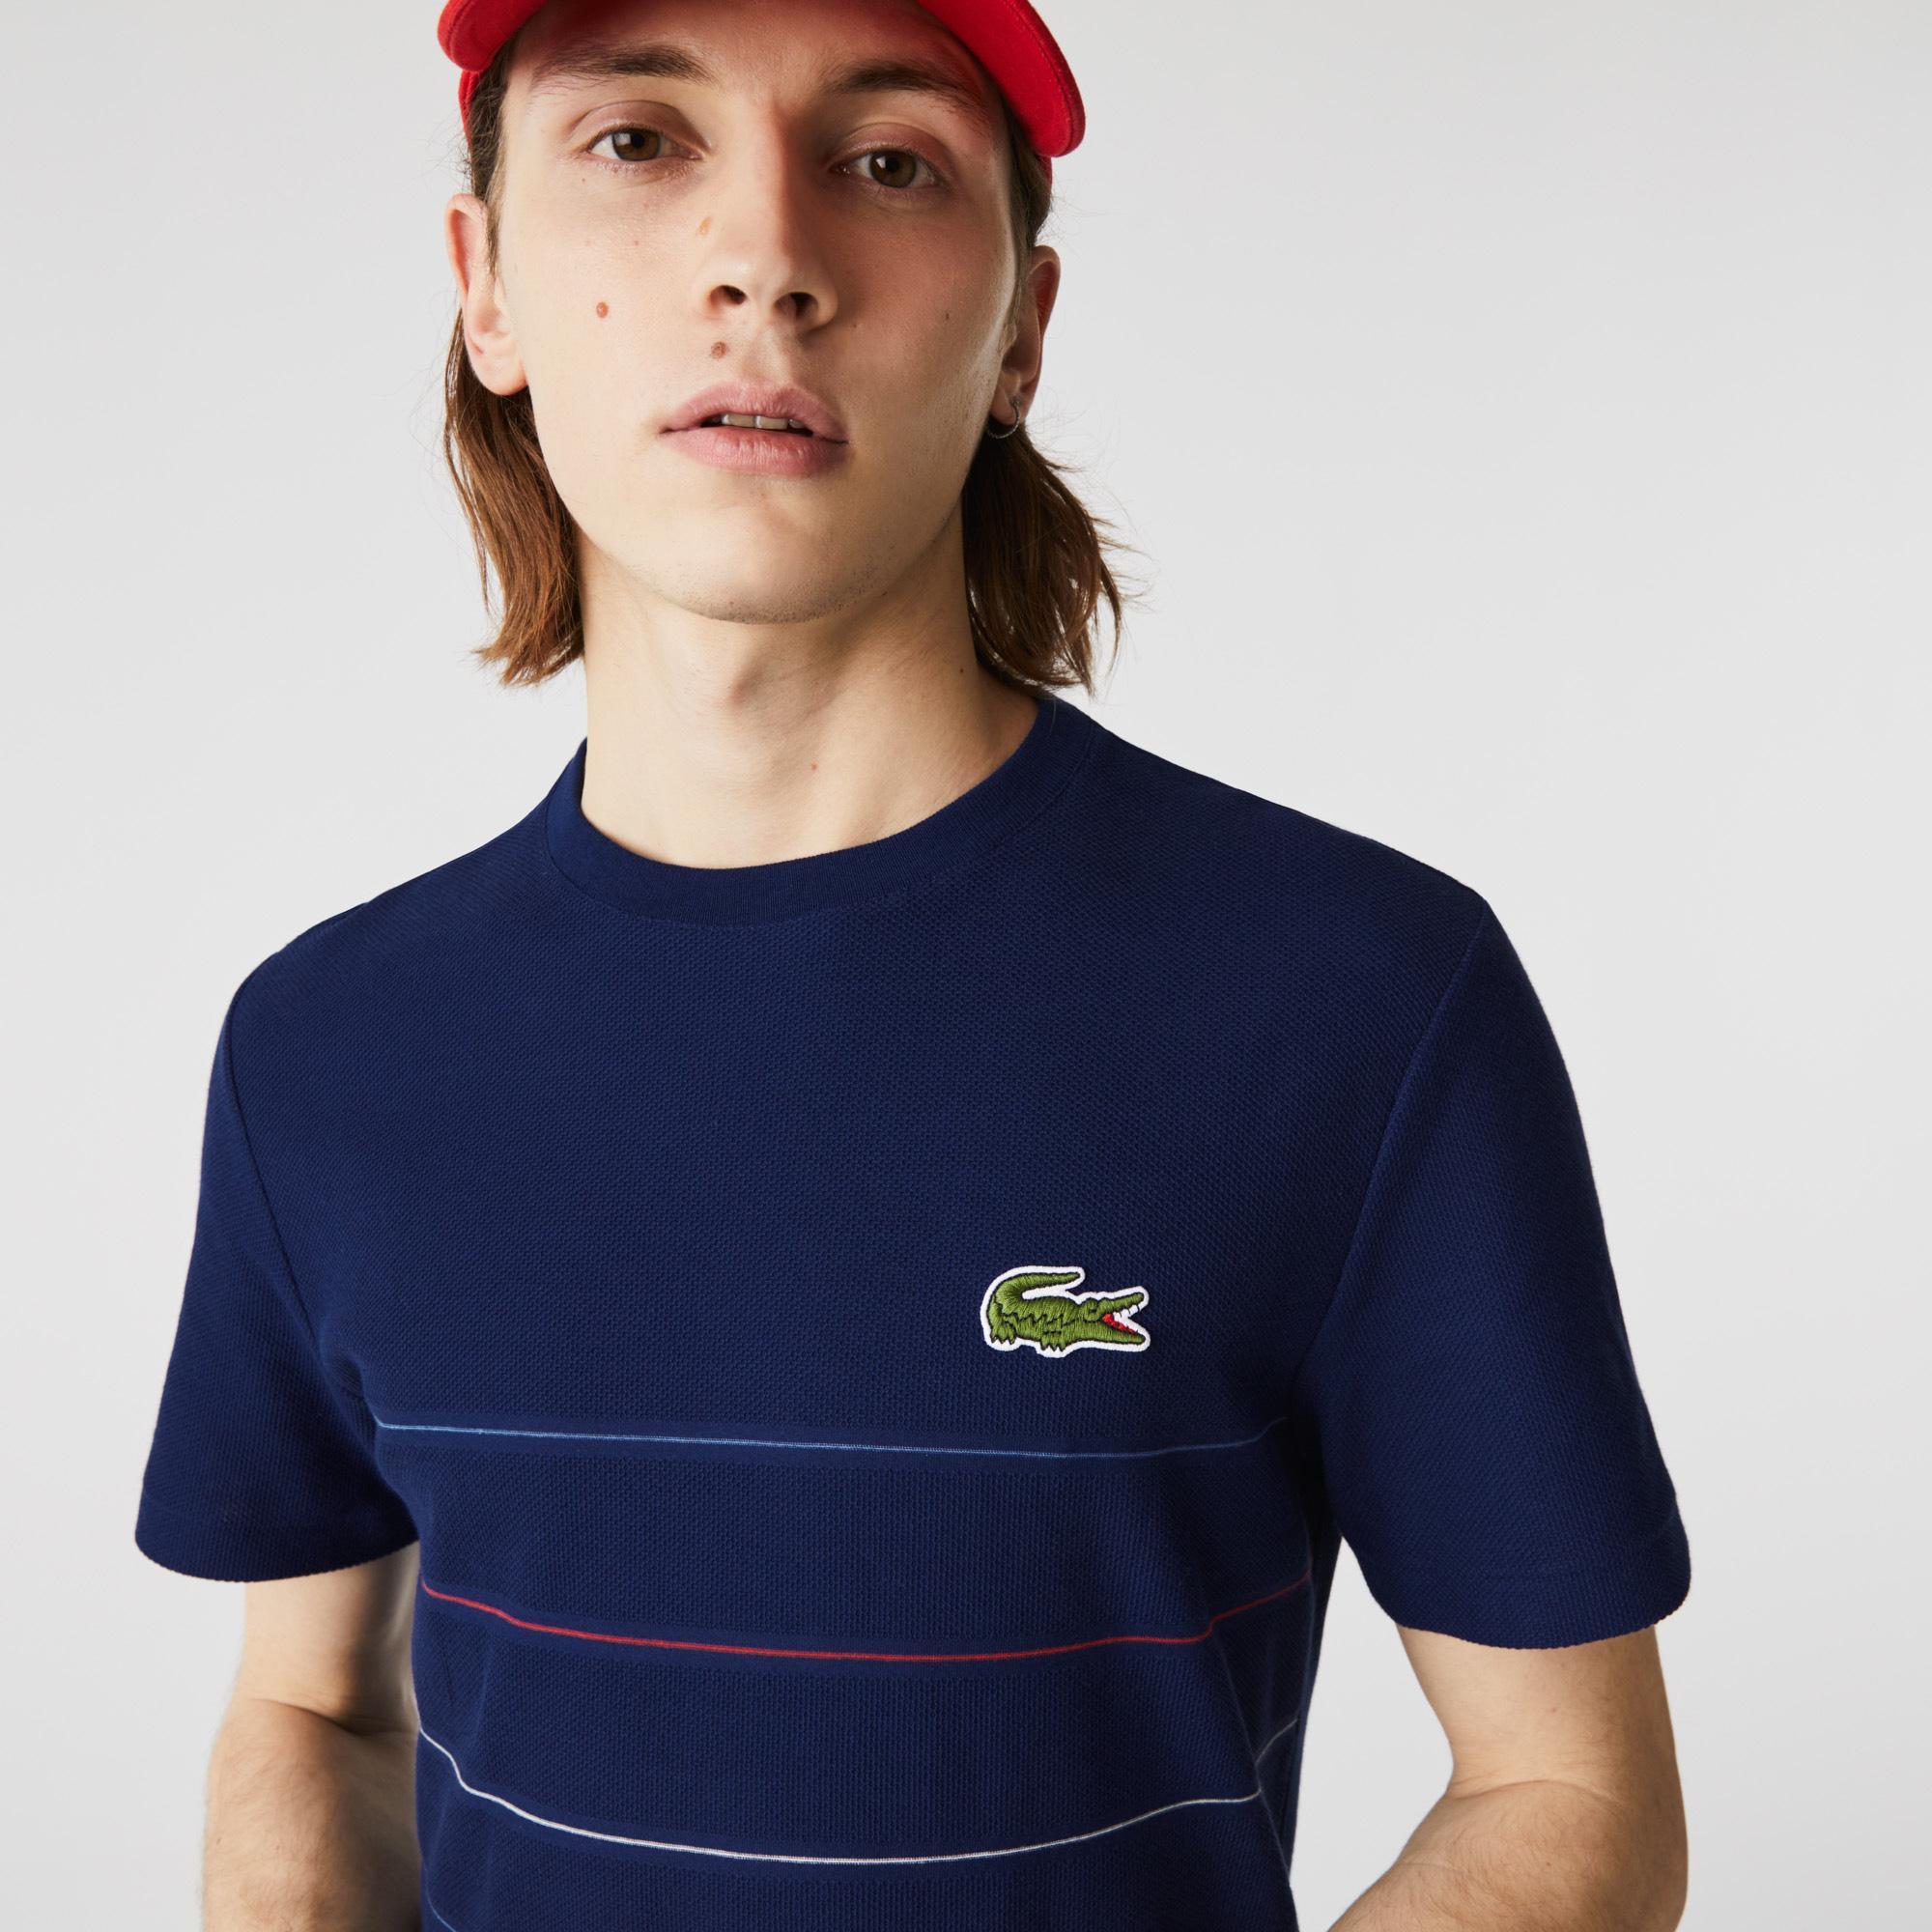 Lacoste Erkek Regular Fit Bisiklet Yaka Çizgili Lacivert T-Shirt